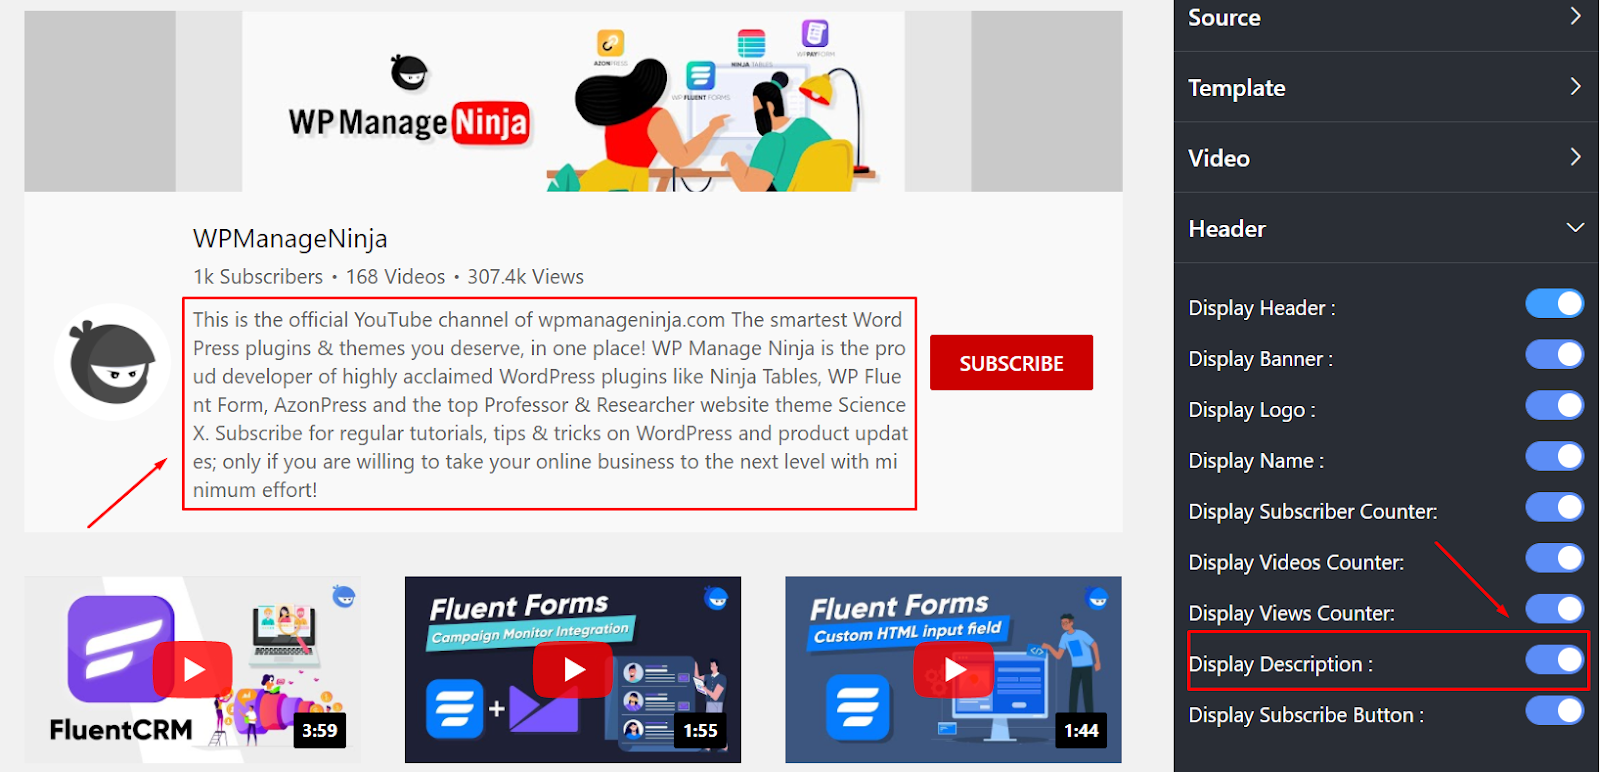 display description youtube settings